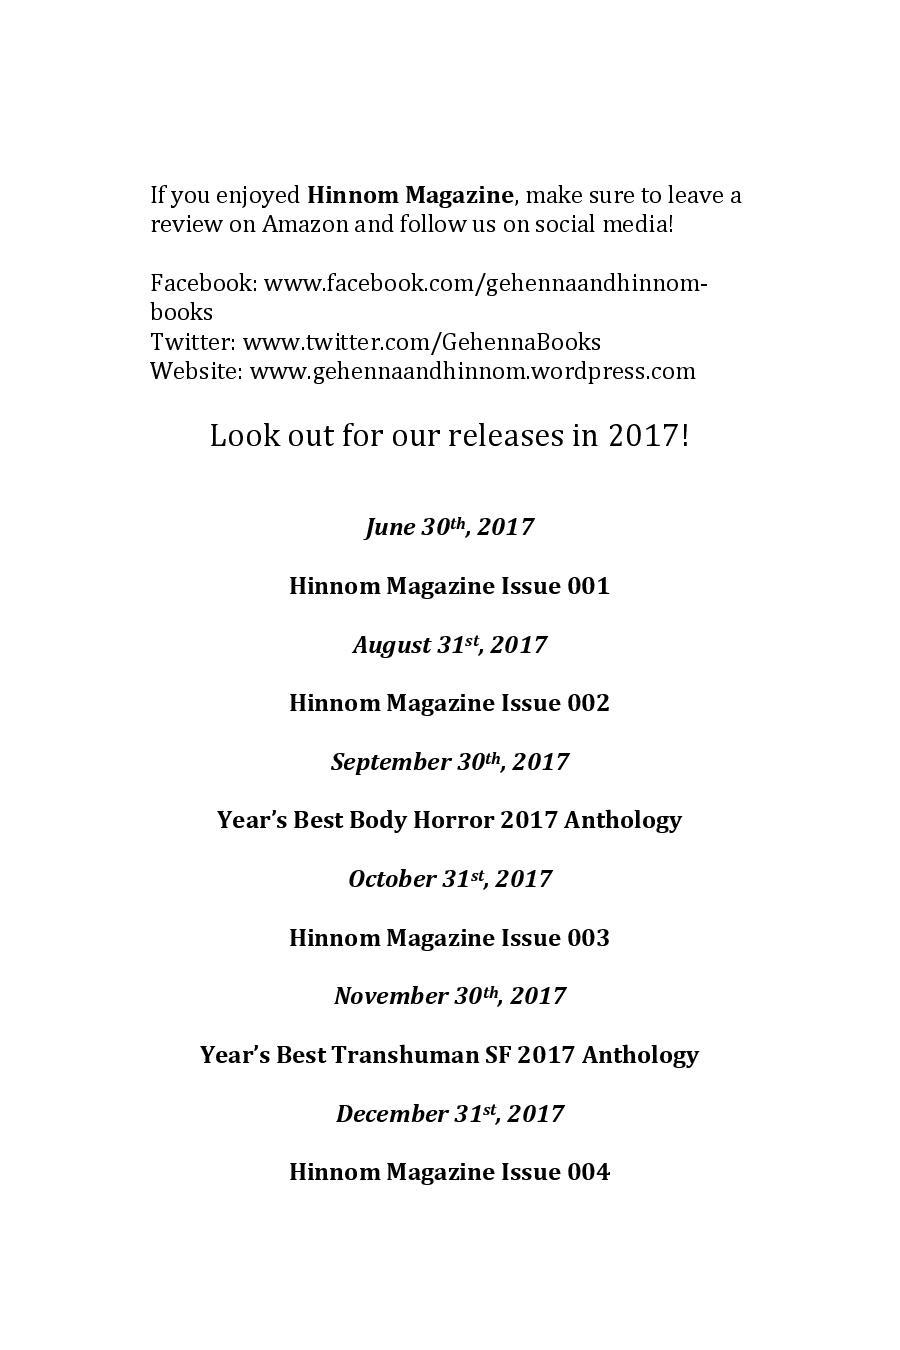 Hinnom Magazine 002 Manuscript E-Book 2-page-211